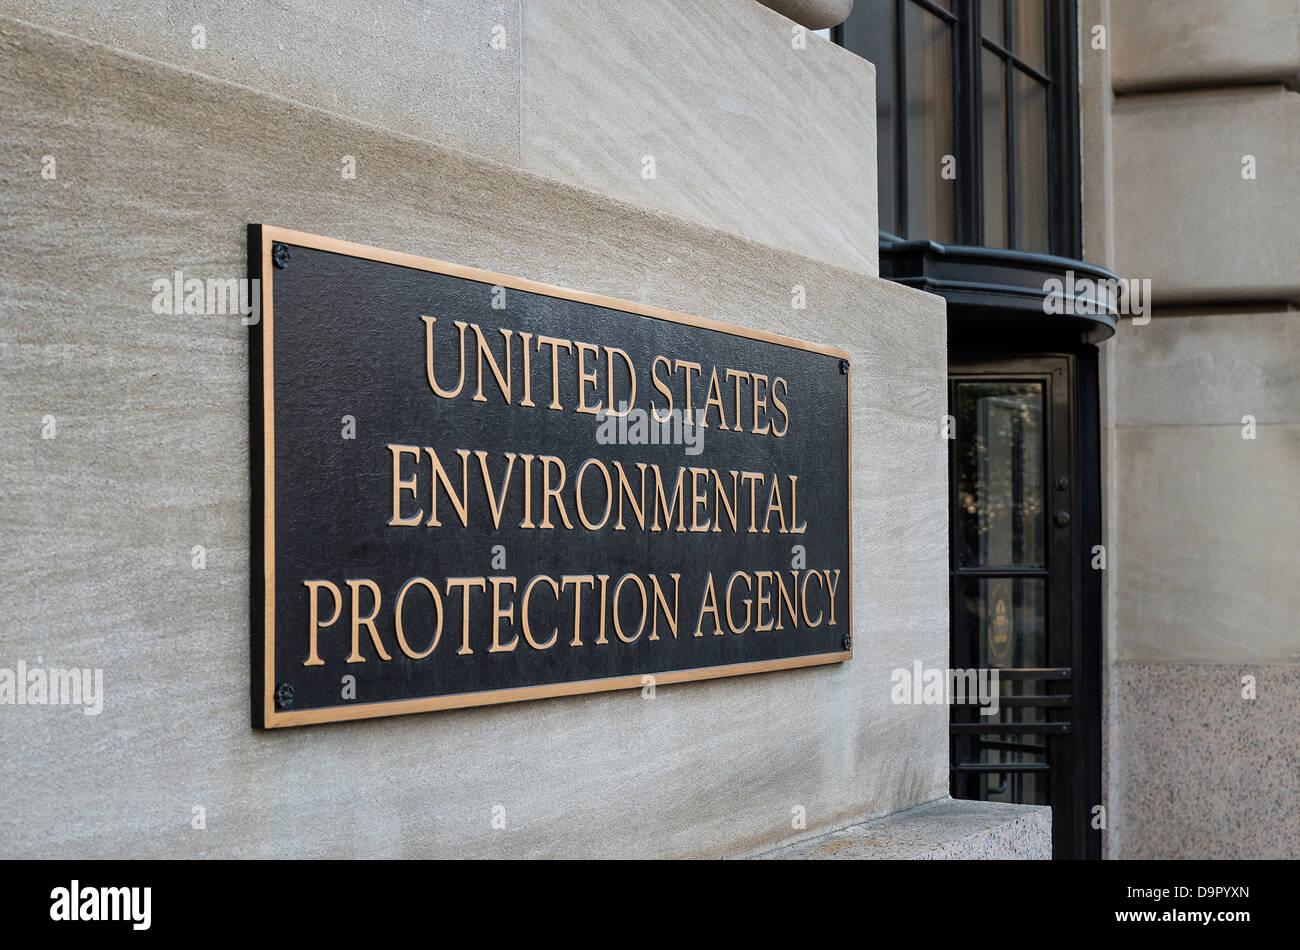 EPA building, United States Environmental Protection Agency, Washington DC, USA - Stock Image